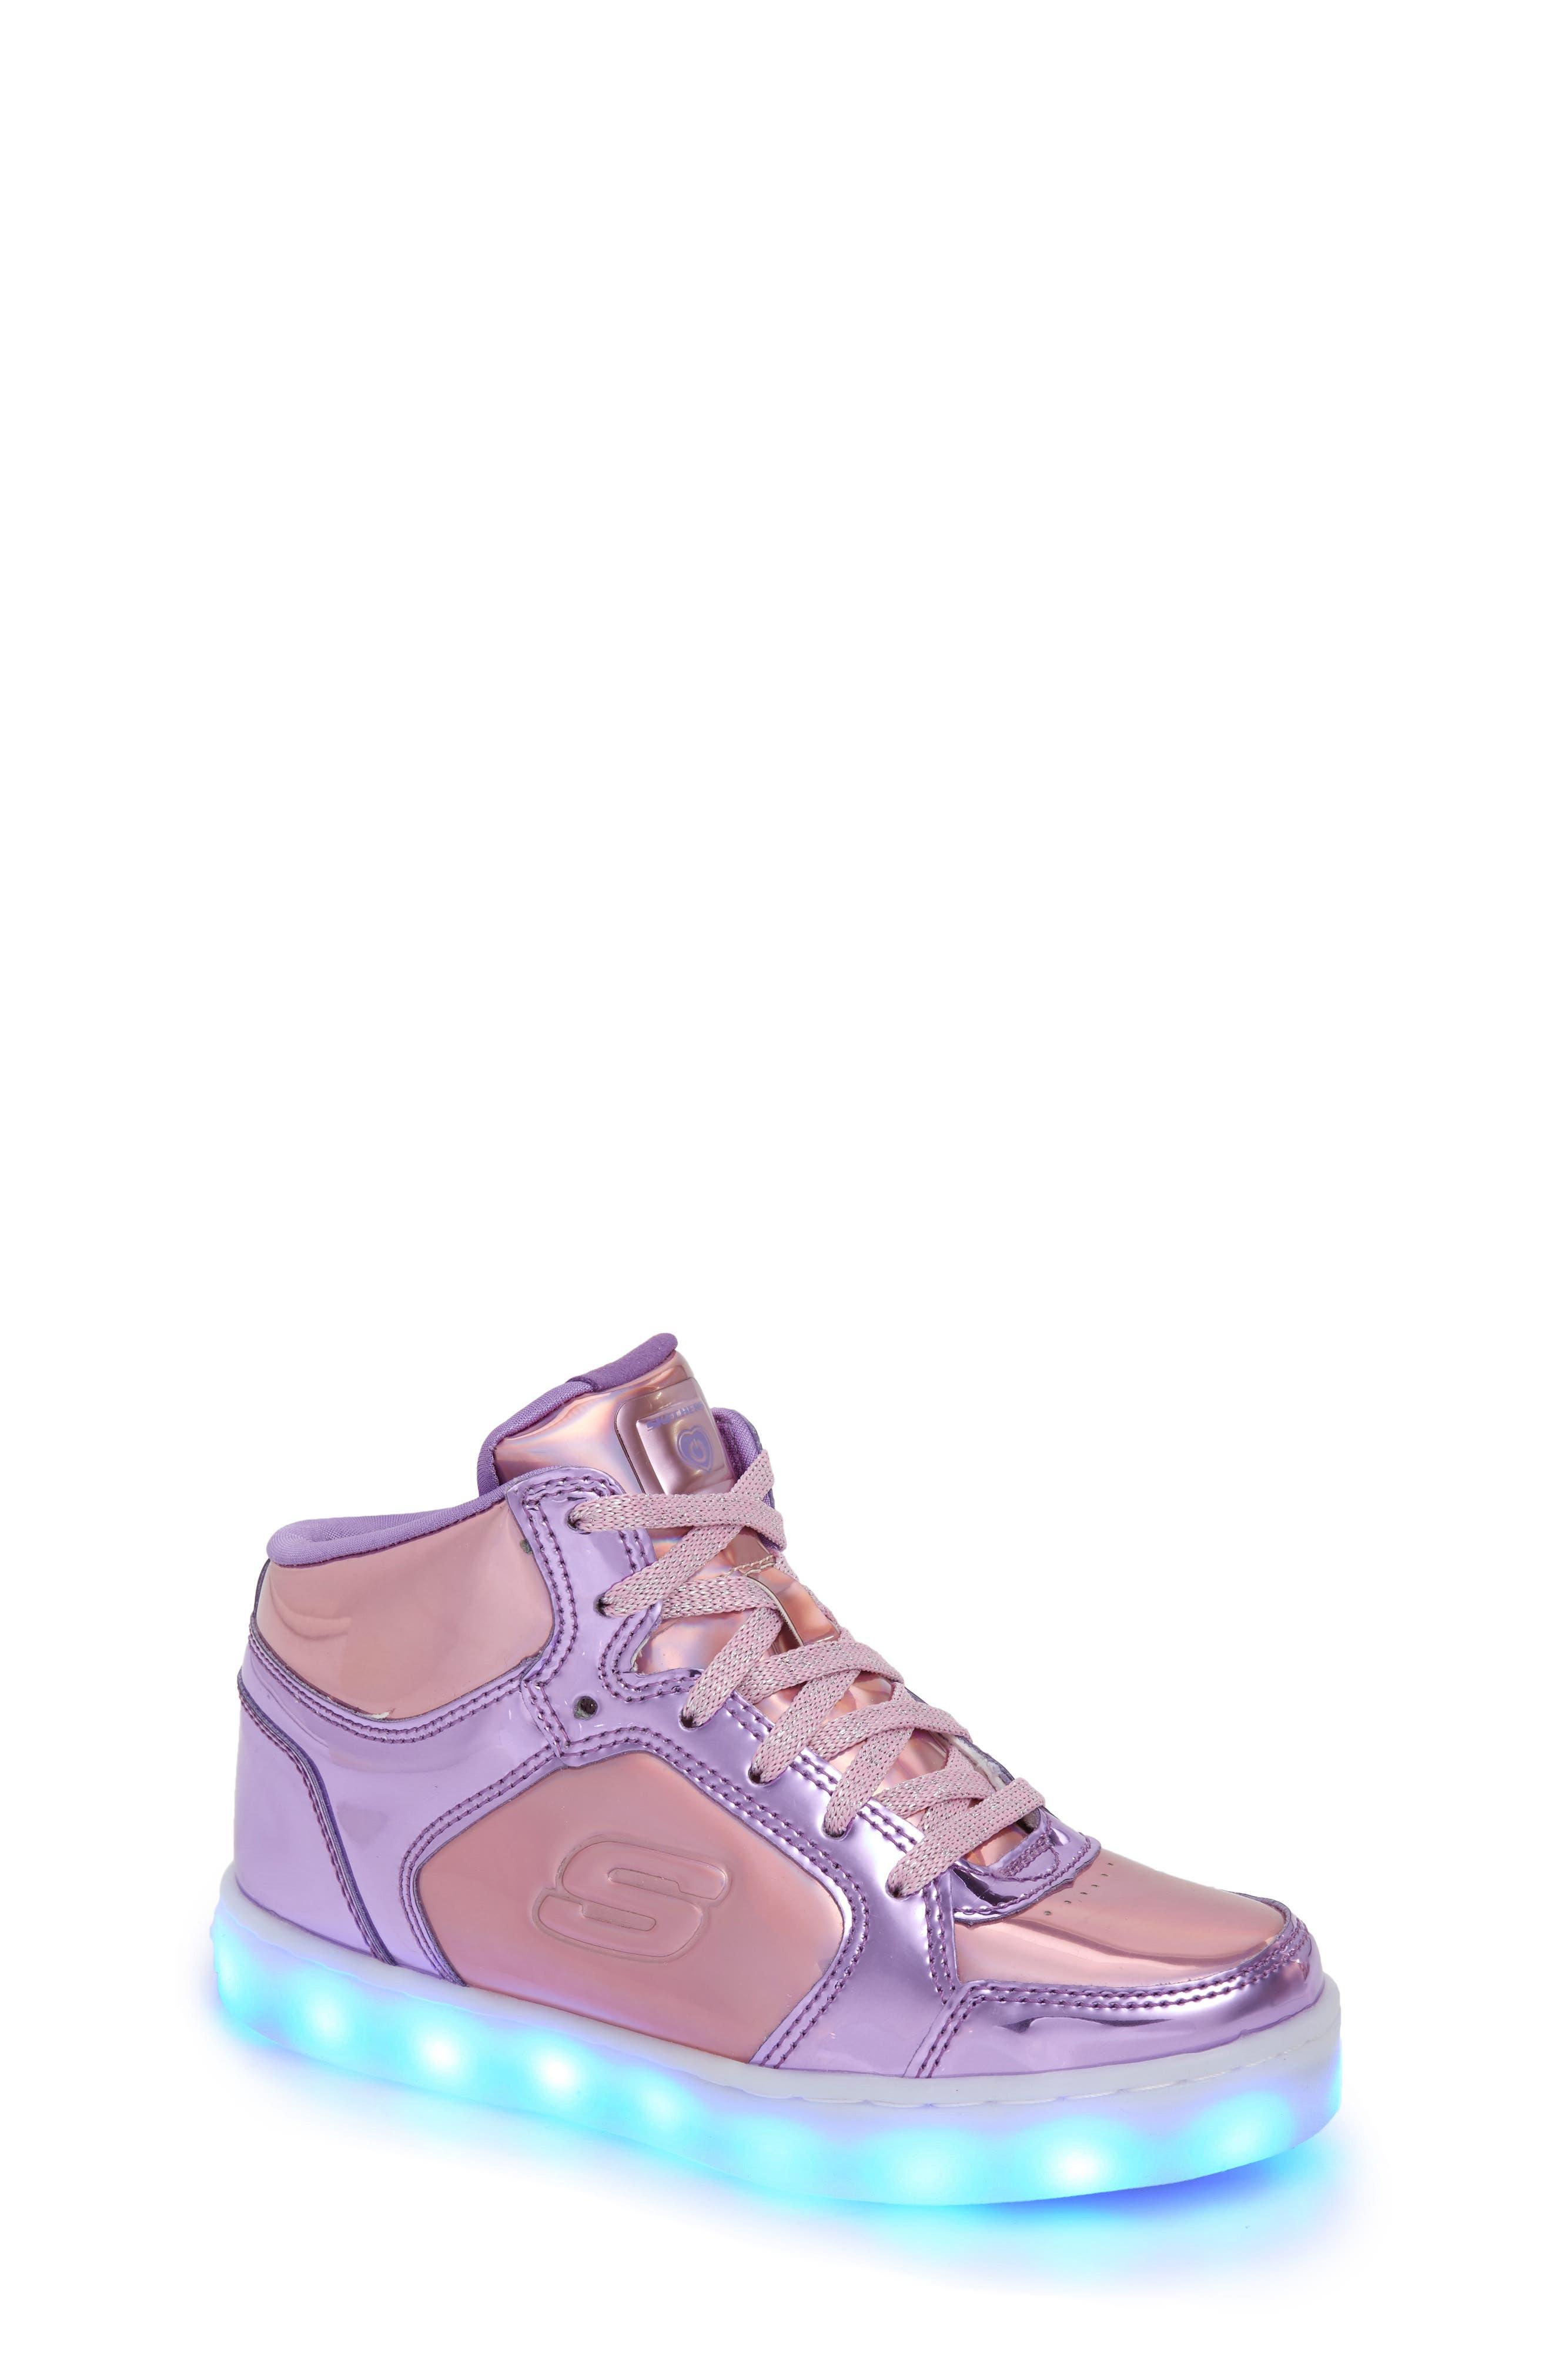 Energy Lights Metallic High Top Sneaker,                             Main thumbnail 1, color,                             Pink/ Purple